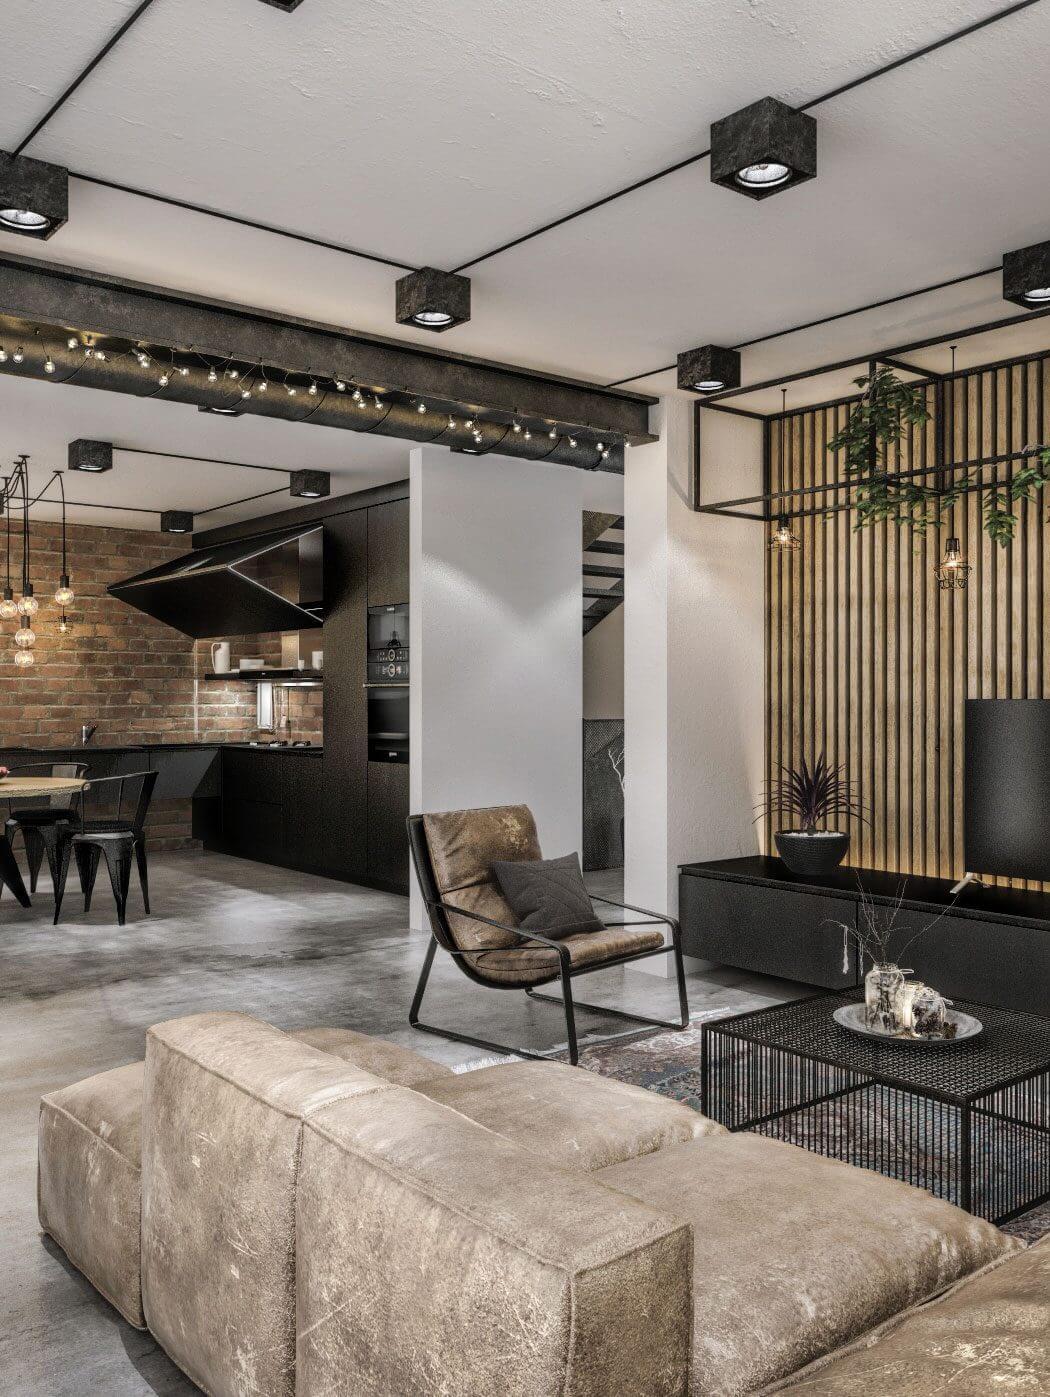 Modern Loft in Kaunas by Idwhite « HomeAdore